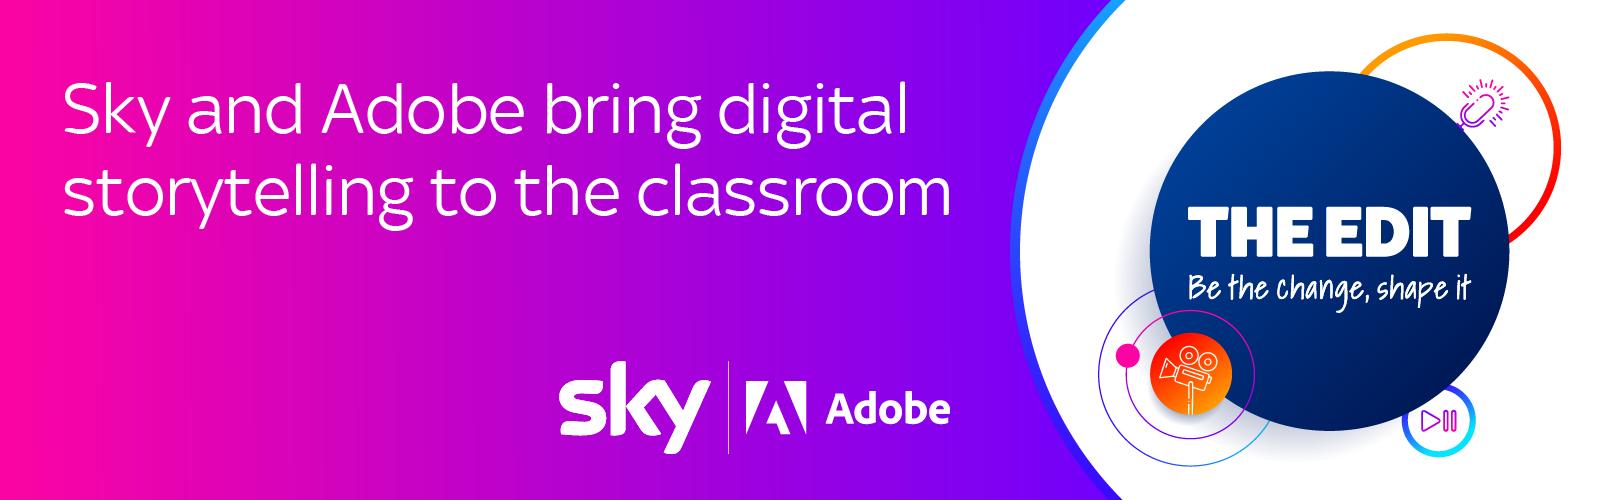 Sky Adobe The Edit logo banner